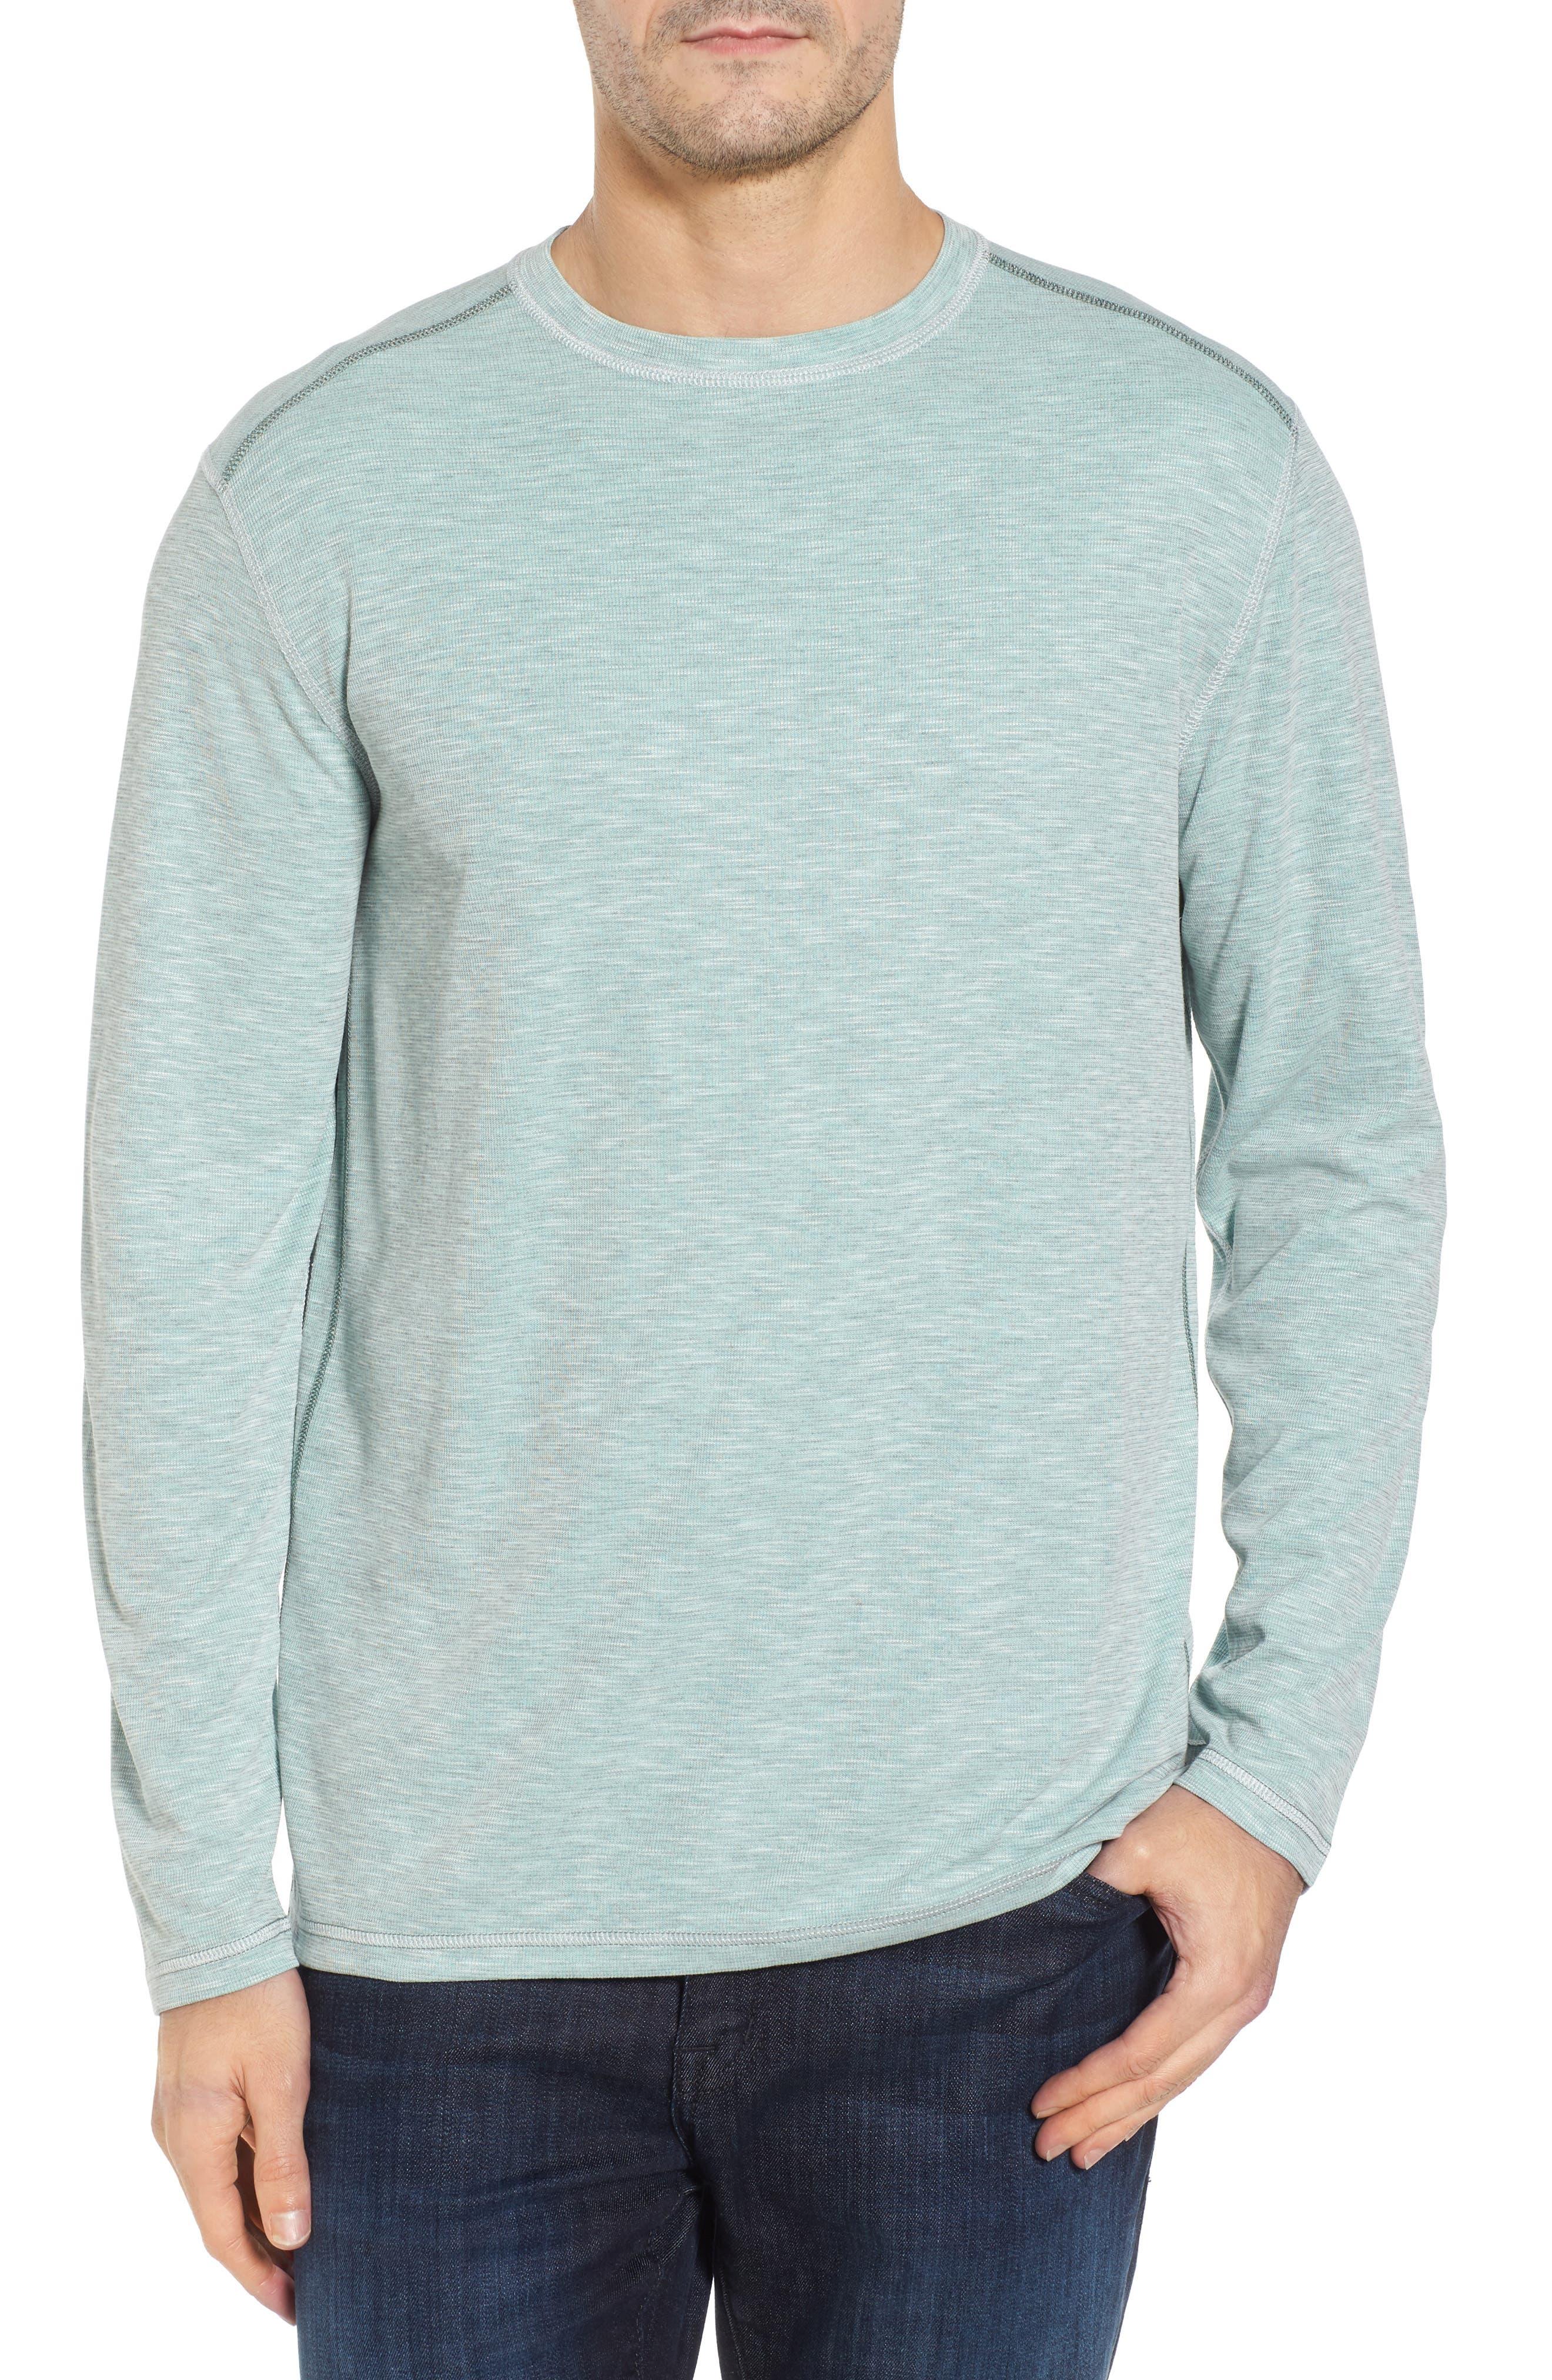 Tommy Bahama Flip Tide Standard Fit T-Shirt